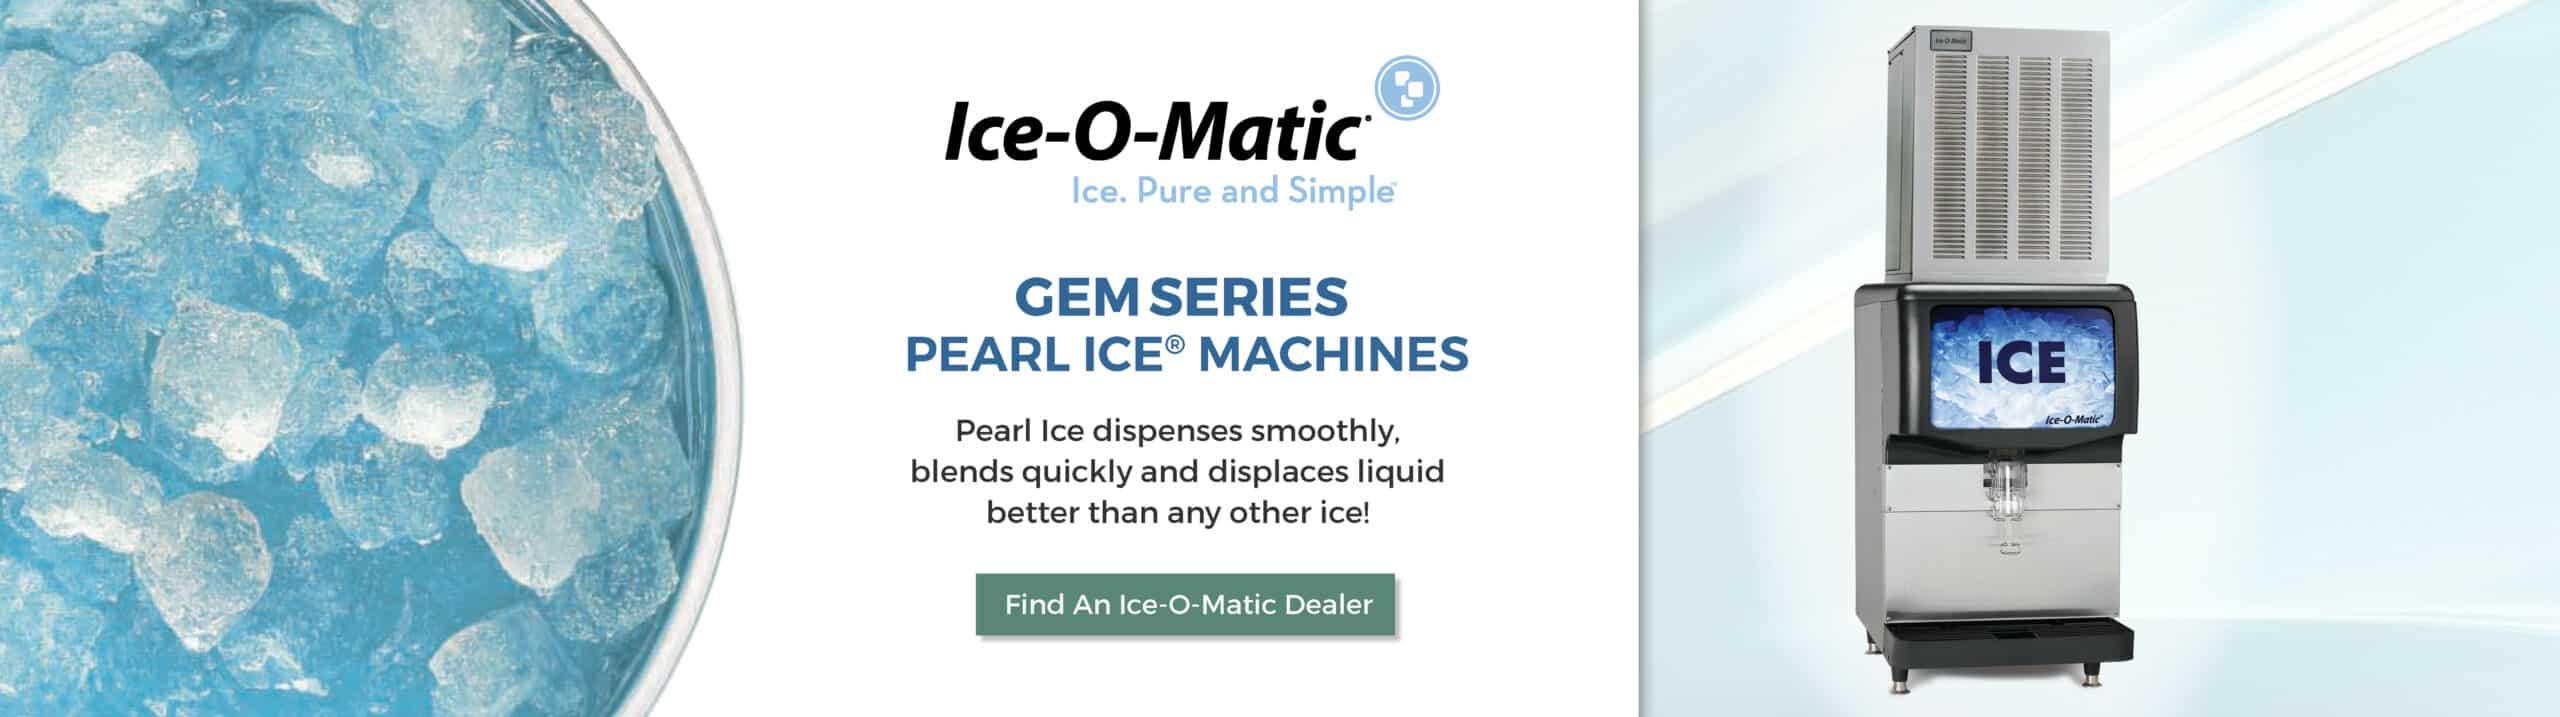 Ice-O-Matic Gem Series